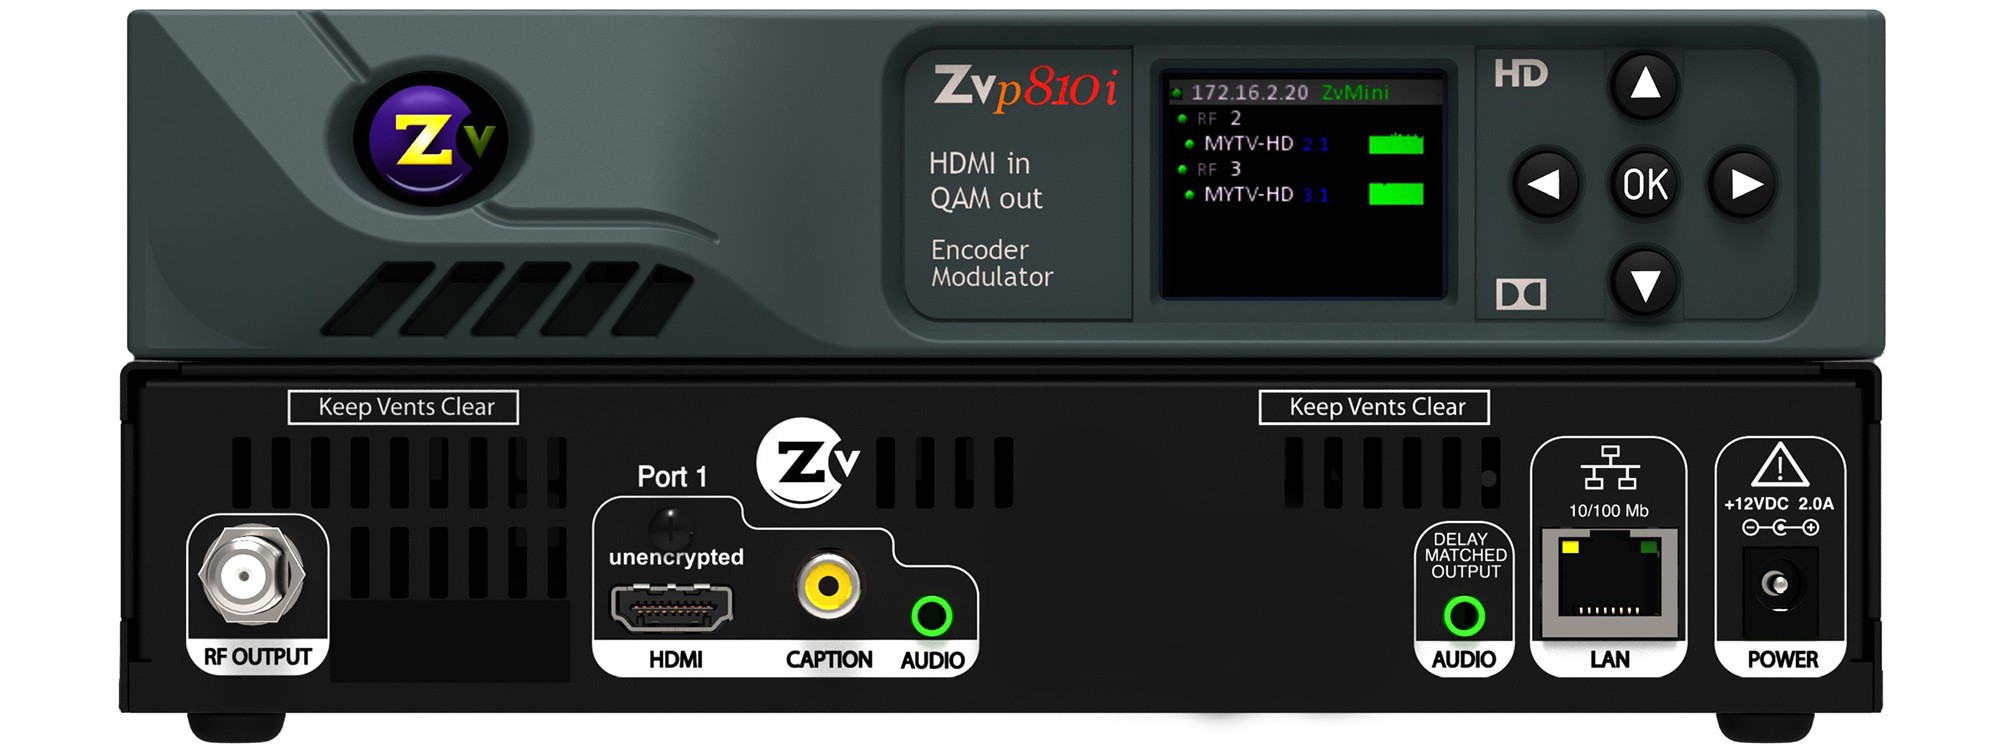 ZVpro820I